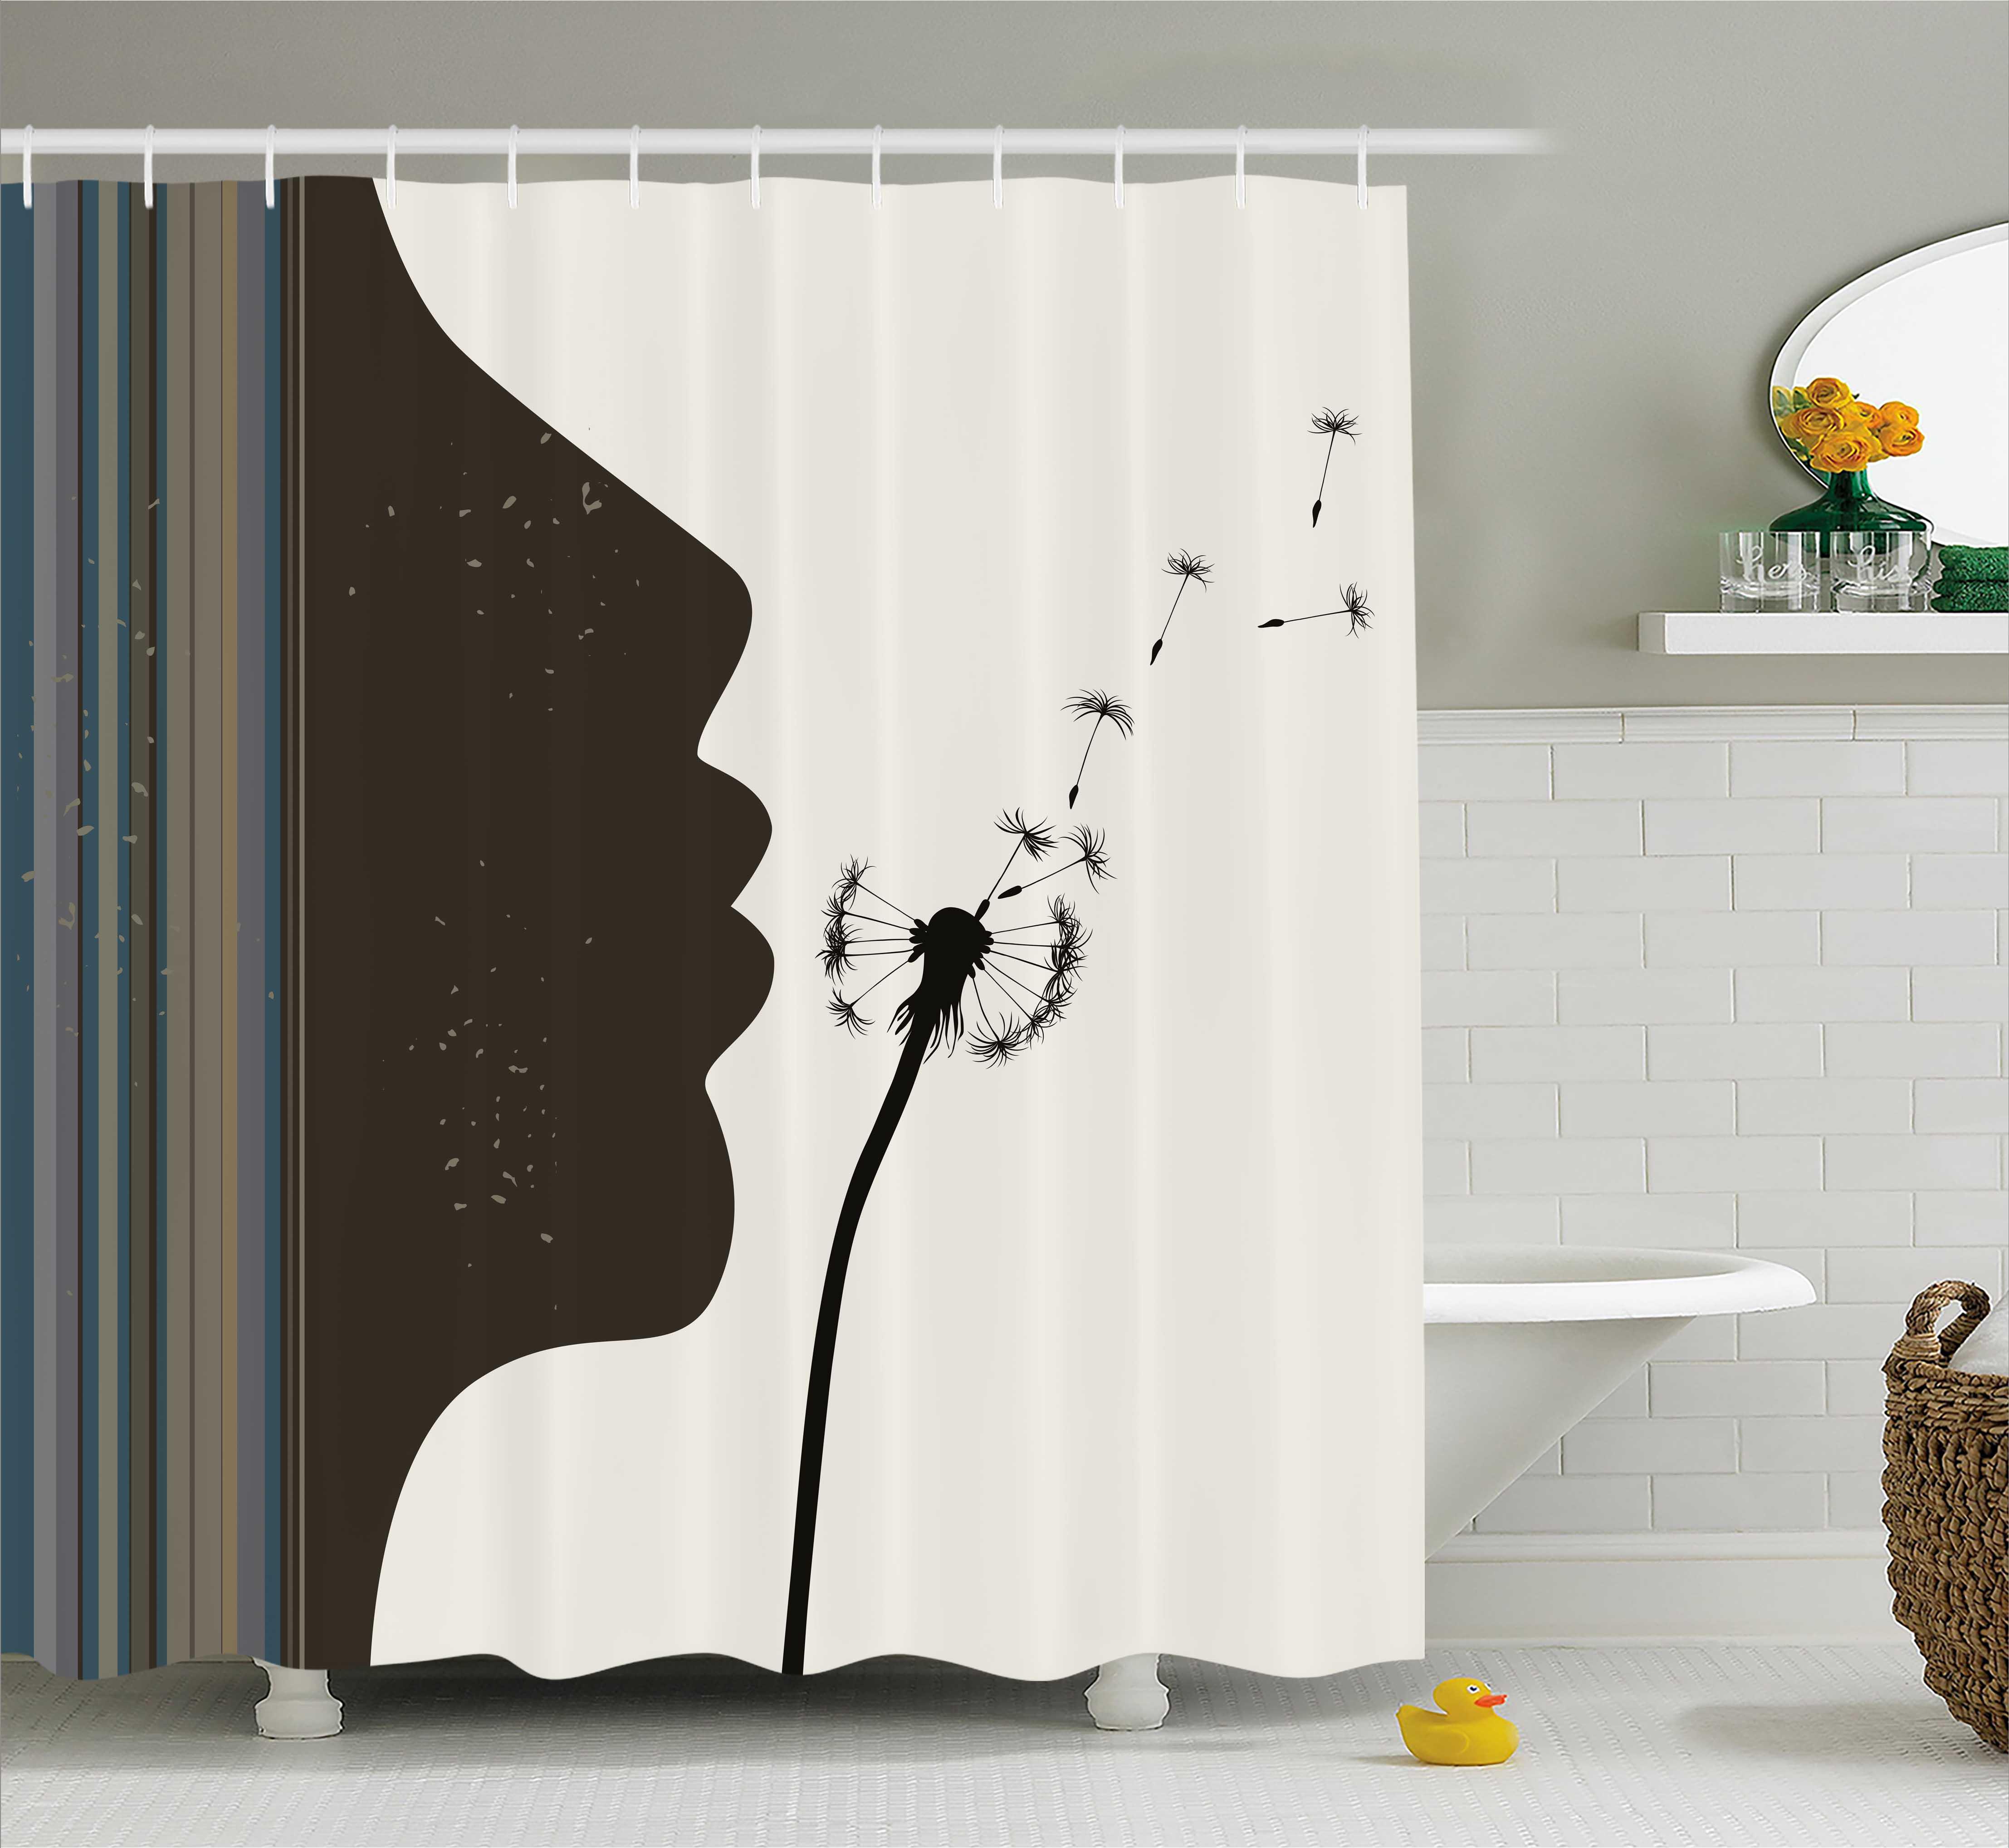 Modern Shower Curtain, Silhouette of a Woman Girl Portrai...